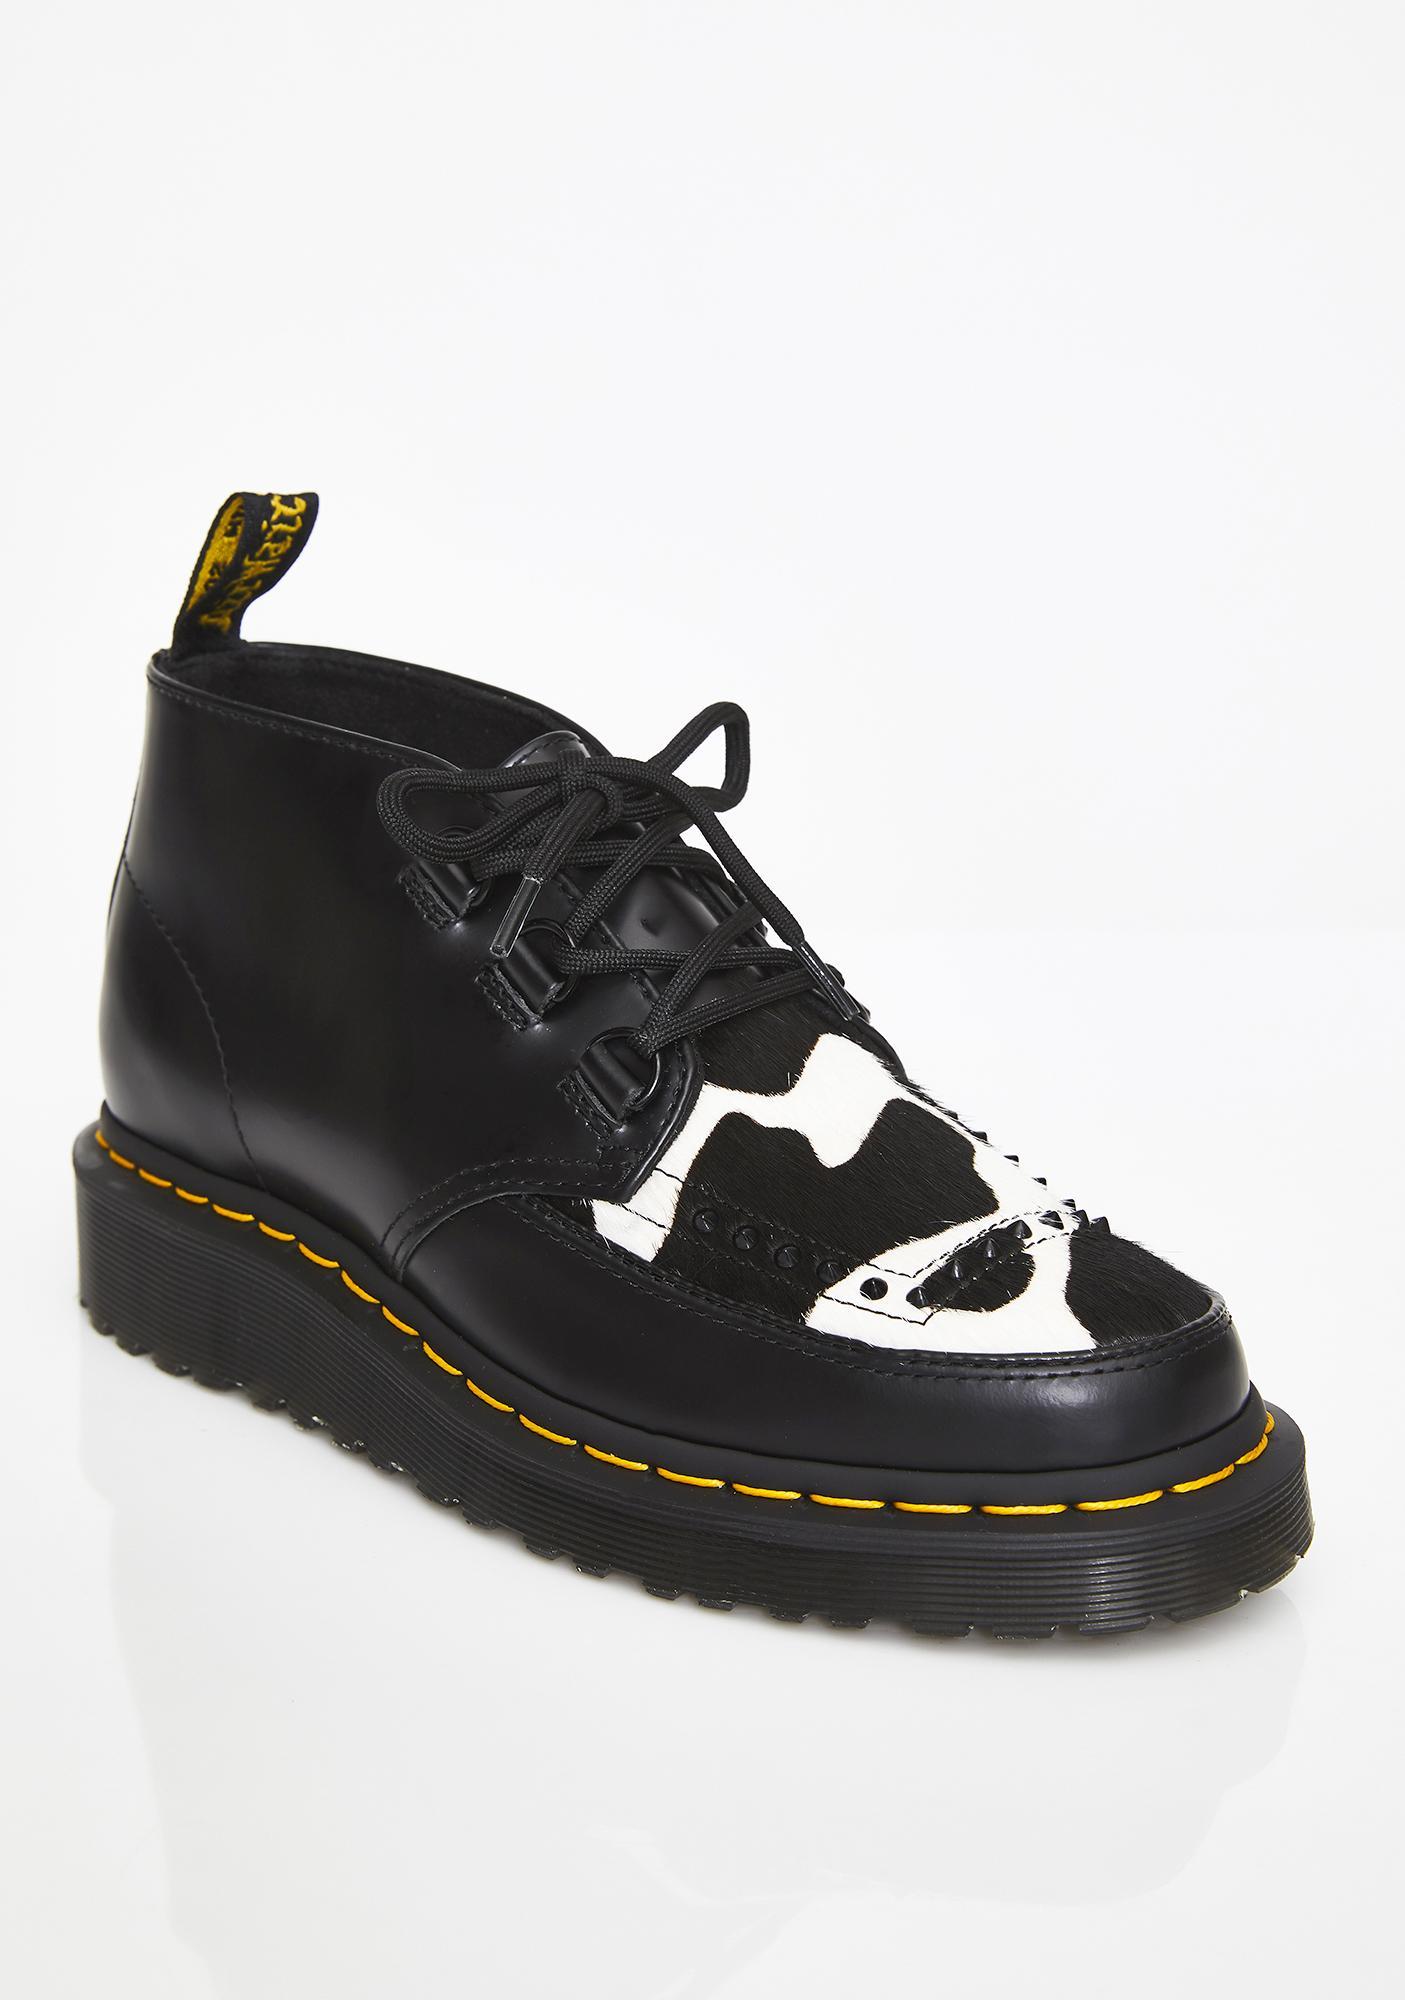 Dr. Martens Ramsey Chukka Boots